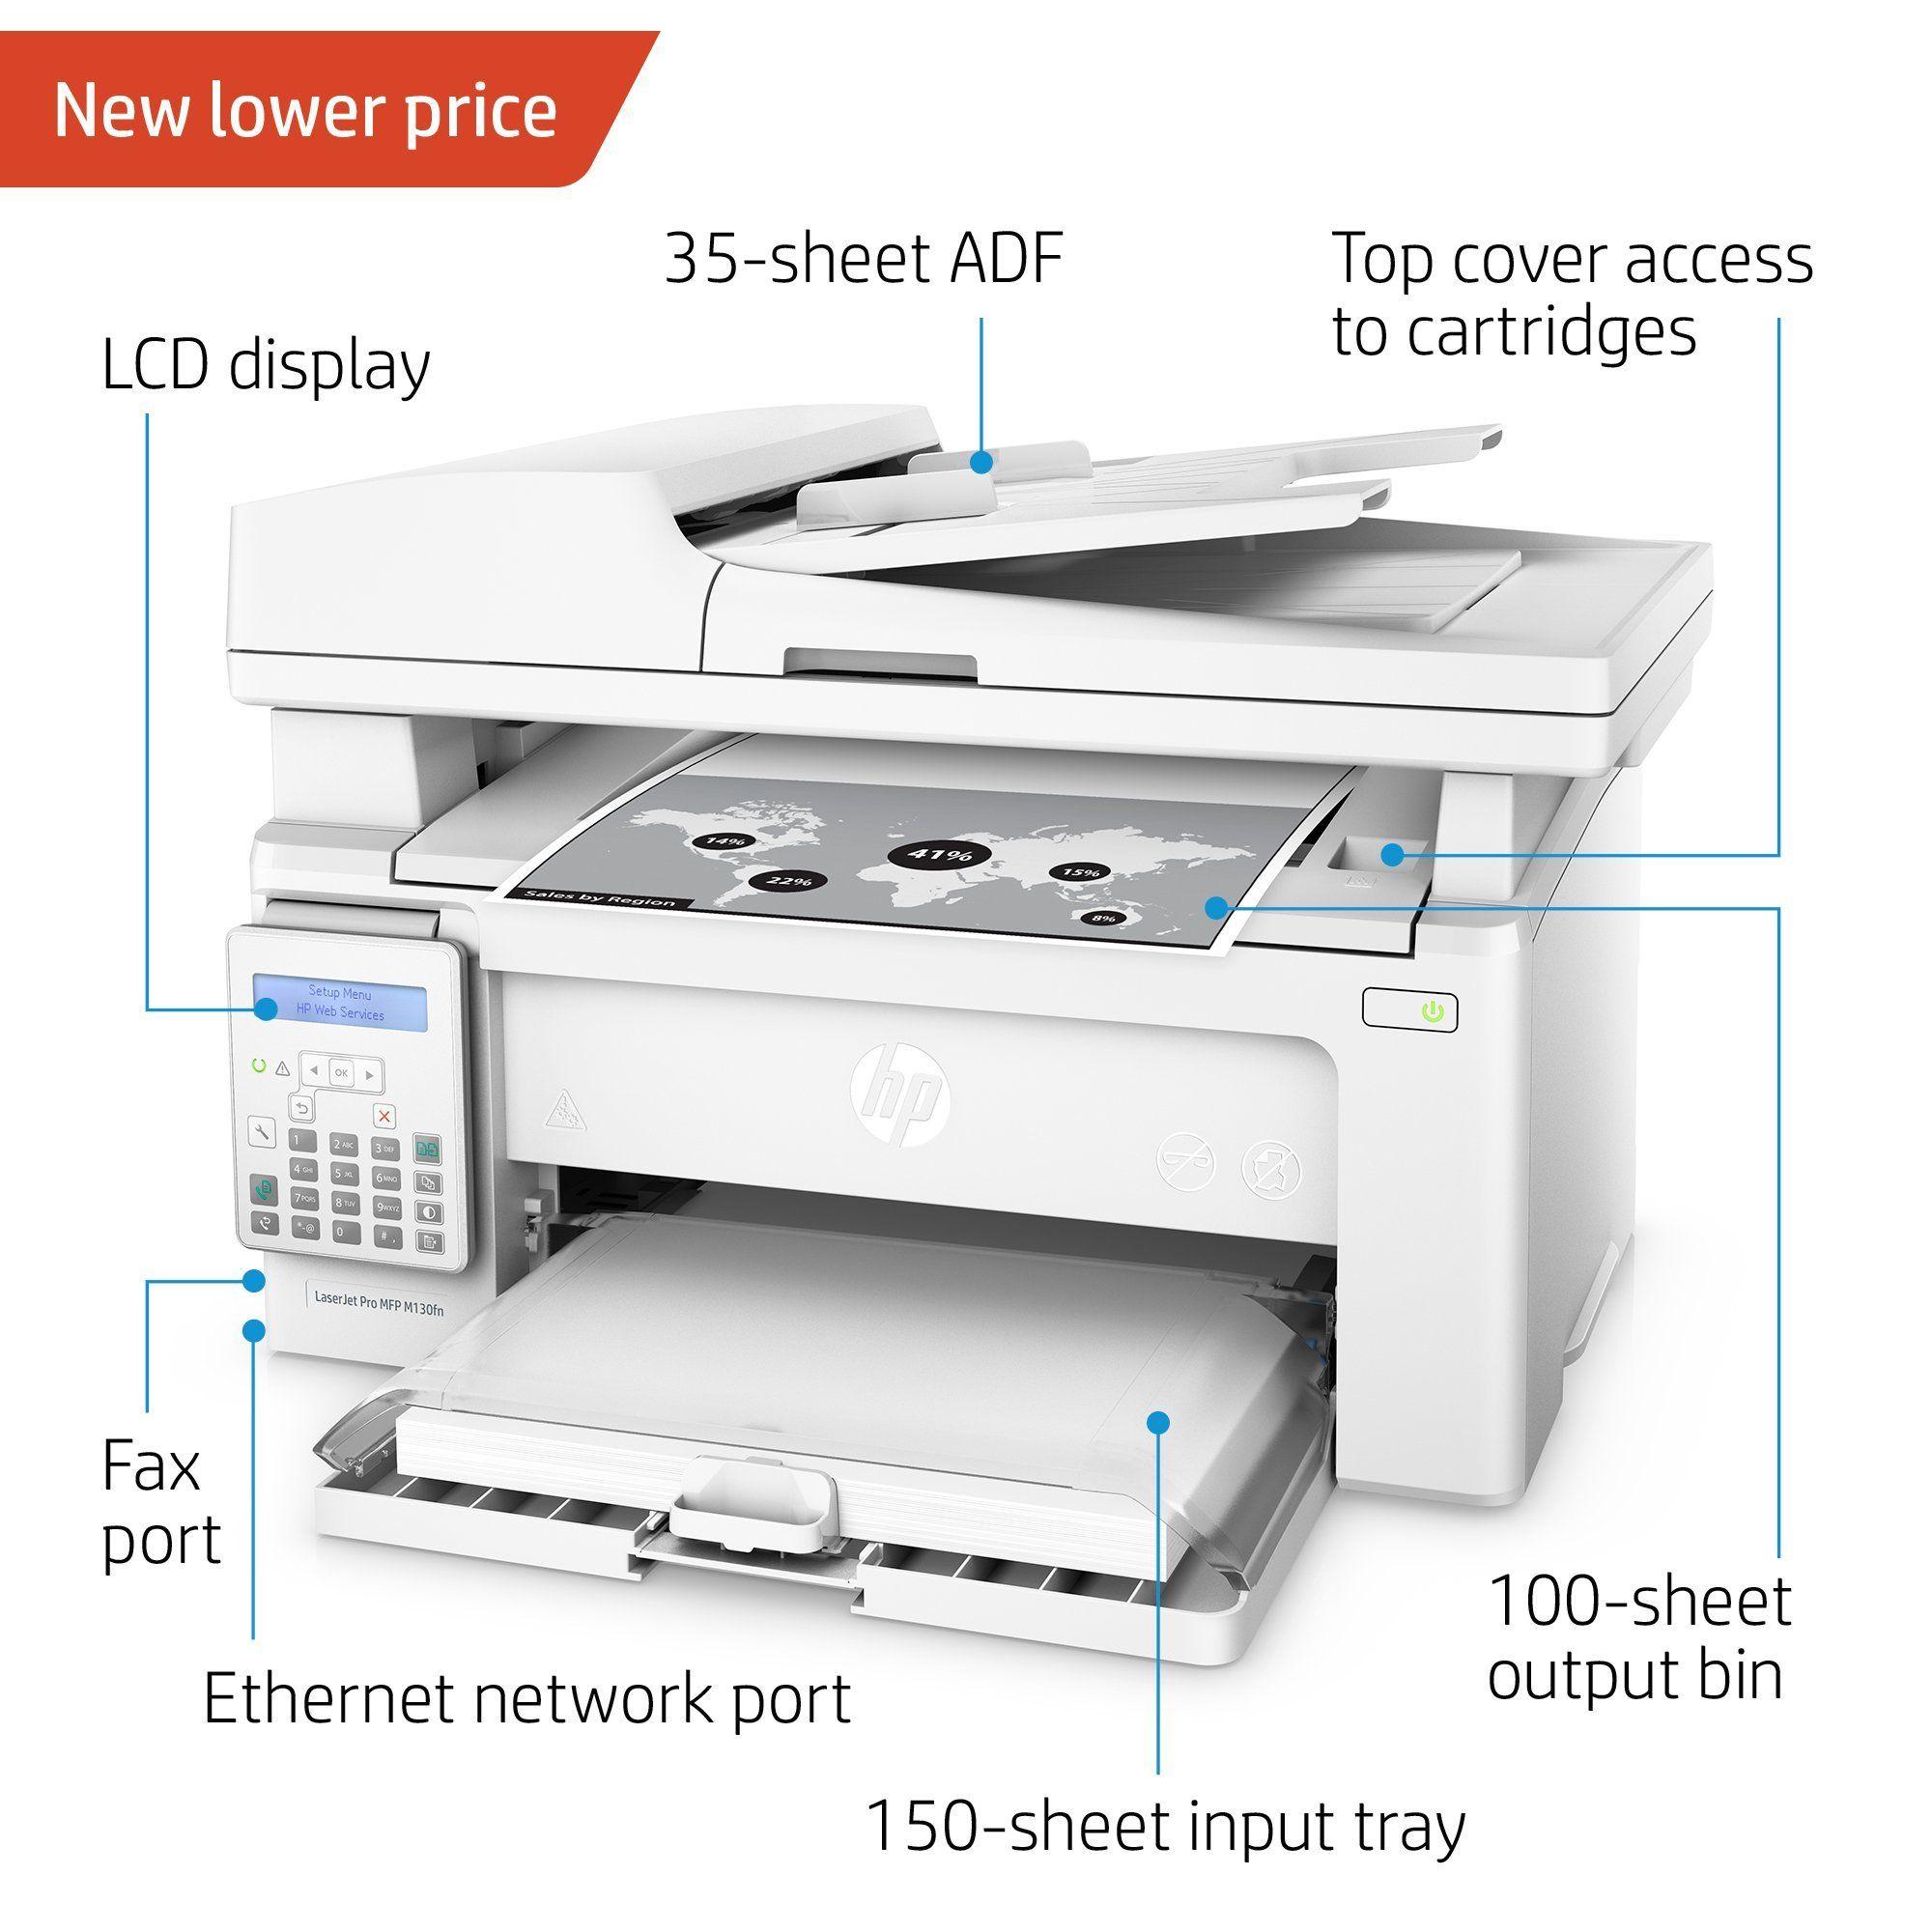 Hp Laserjet Pro M130fn Allinone Laser Printer With Print Security G3q59a Replaces Hp M127fn Laser Printer Certified Refurbi Mobile Print Laser Printer Printer